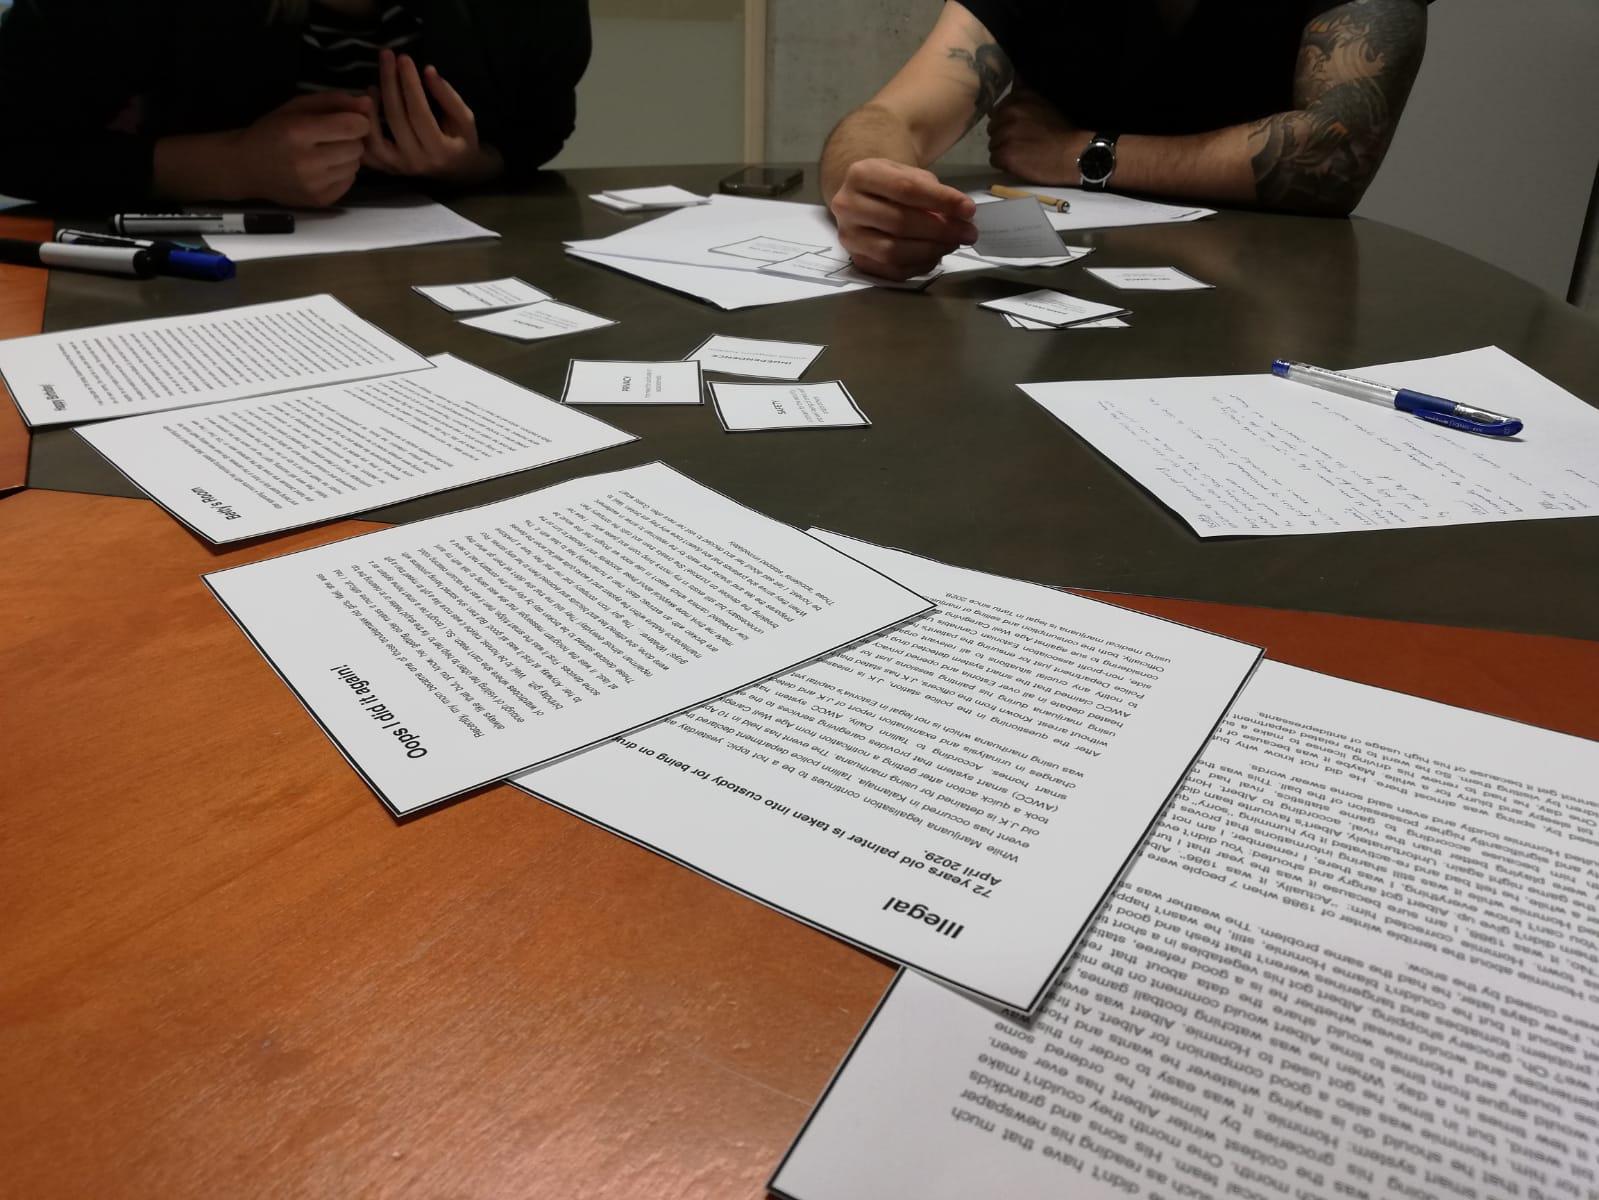 future scenarios workshop